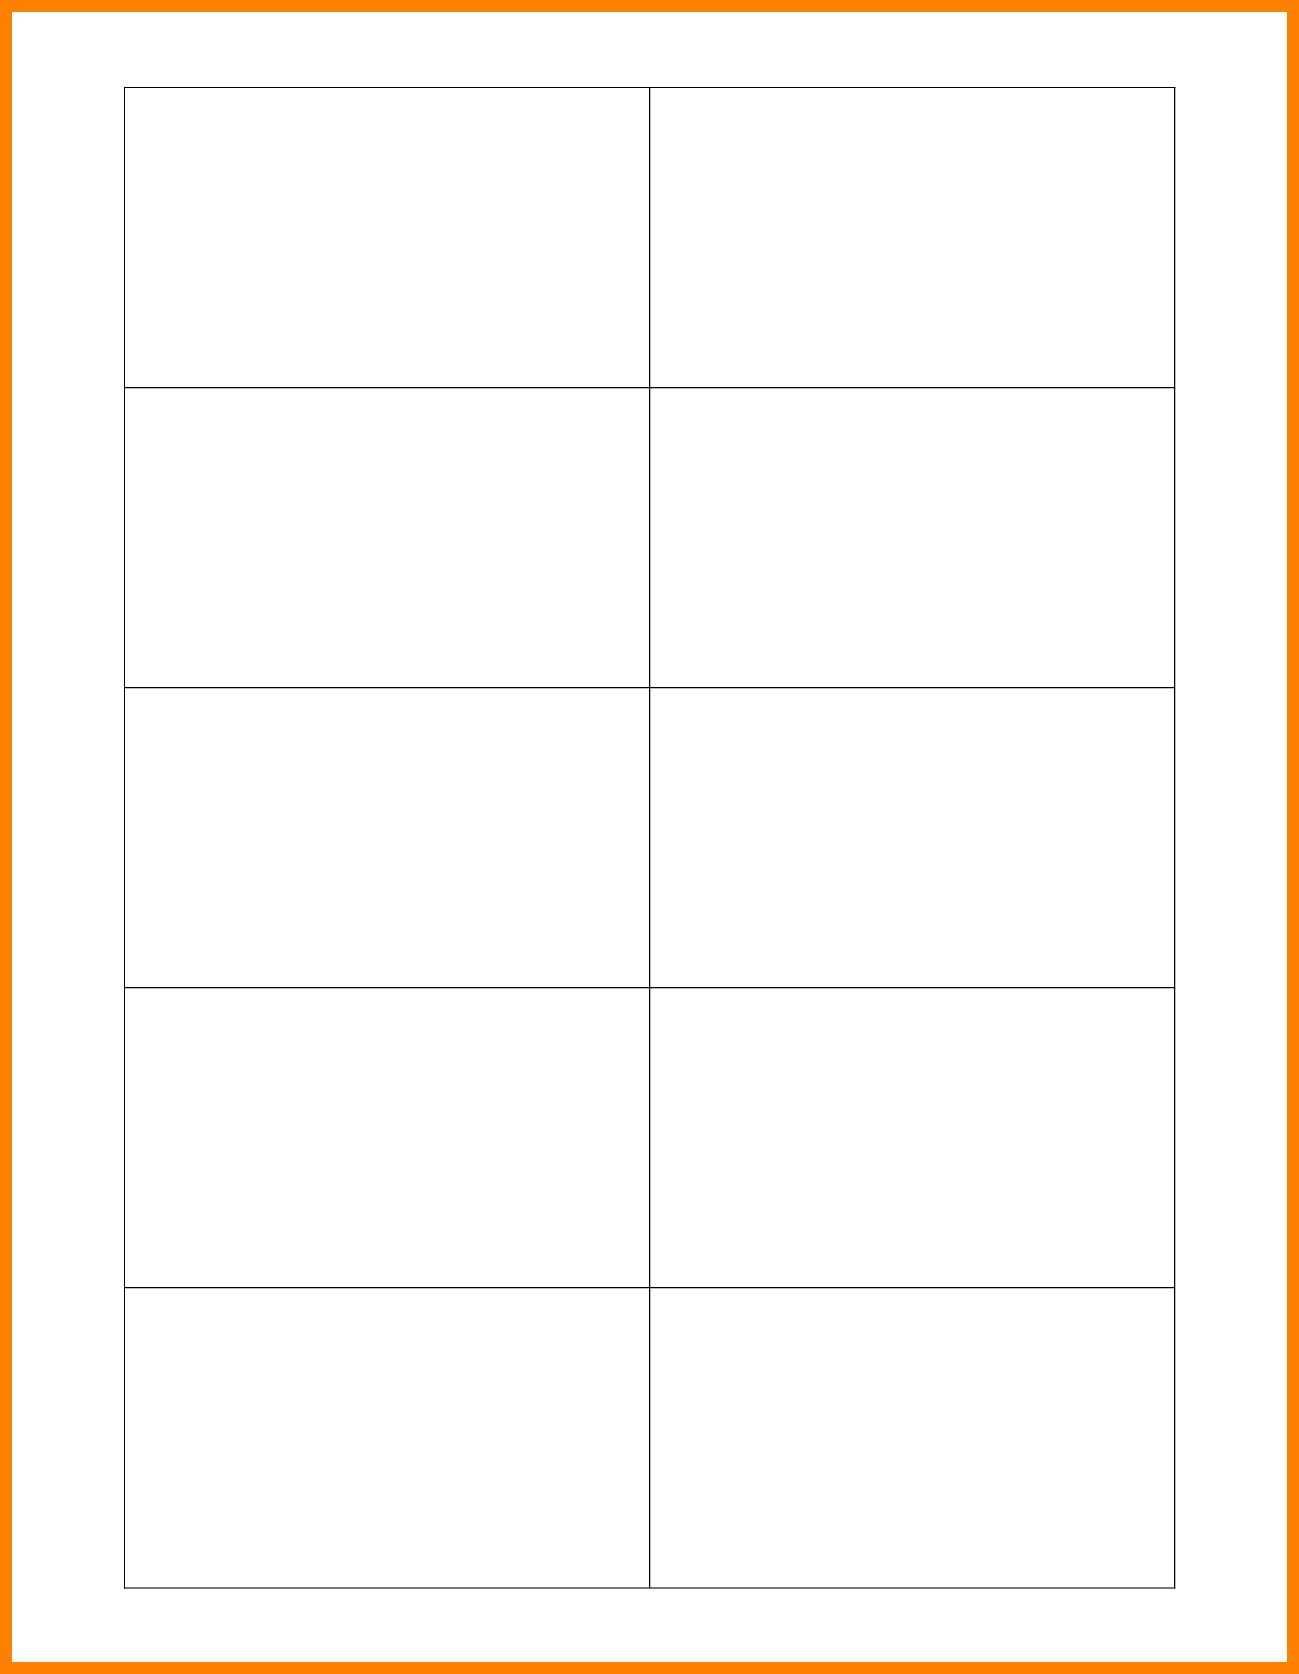 001 Microsoft Word Blank Business Card Template Free Regarding Word 2013 Business Card Template